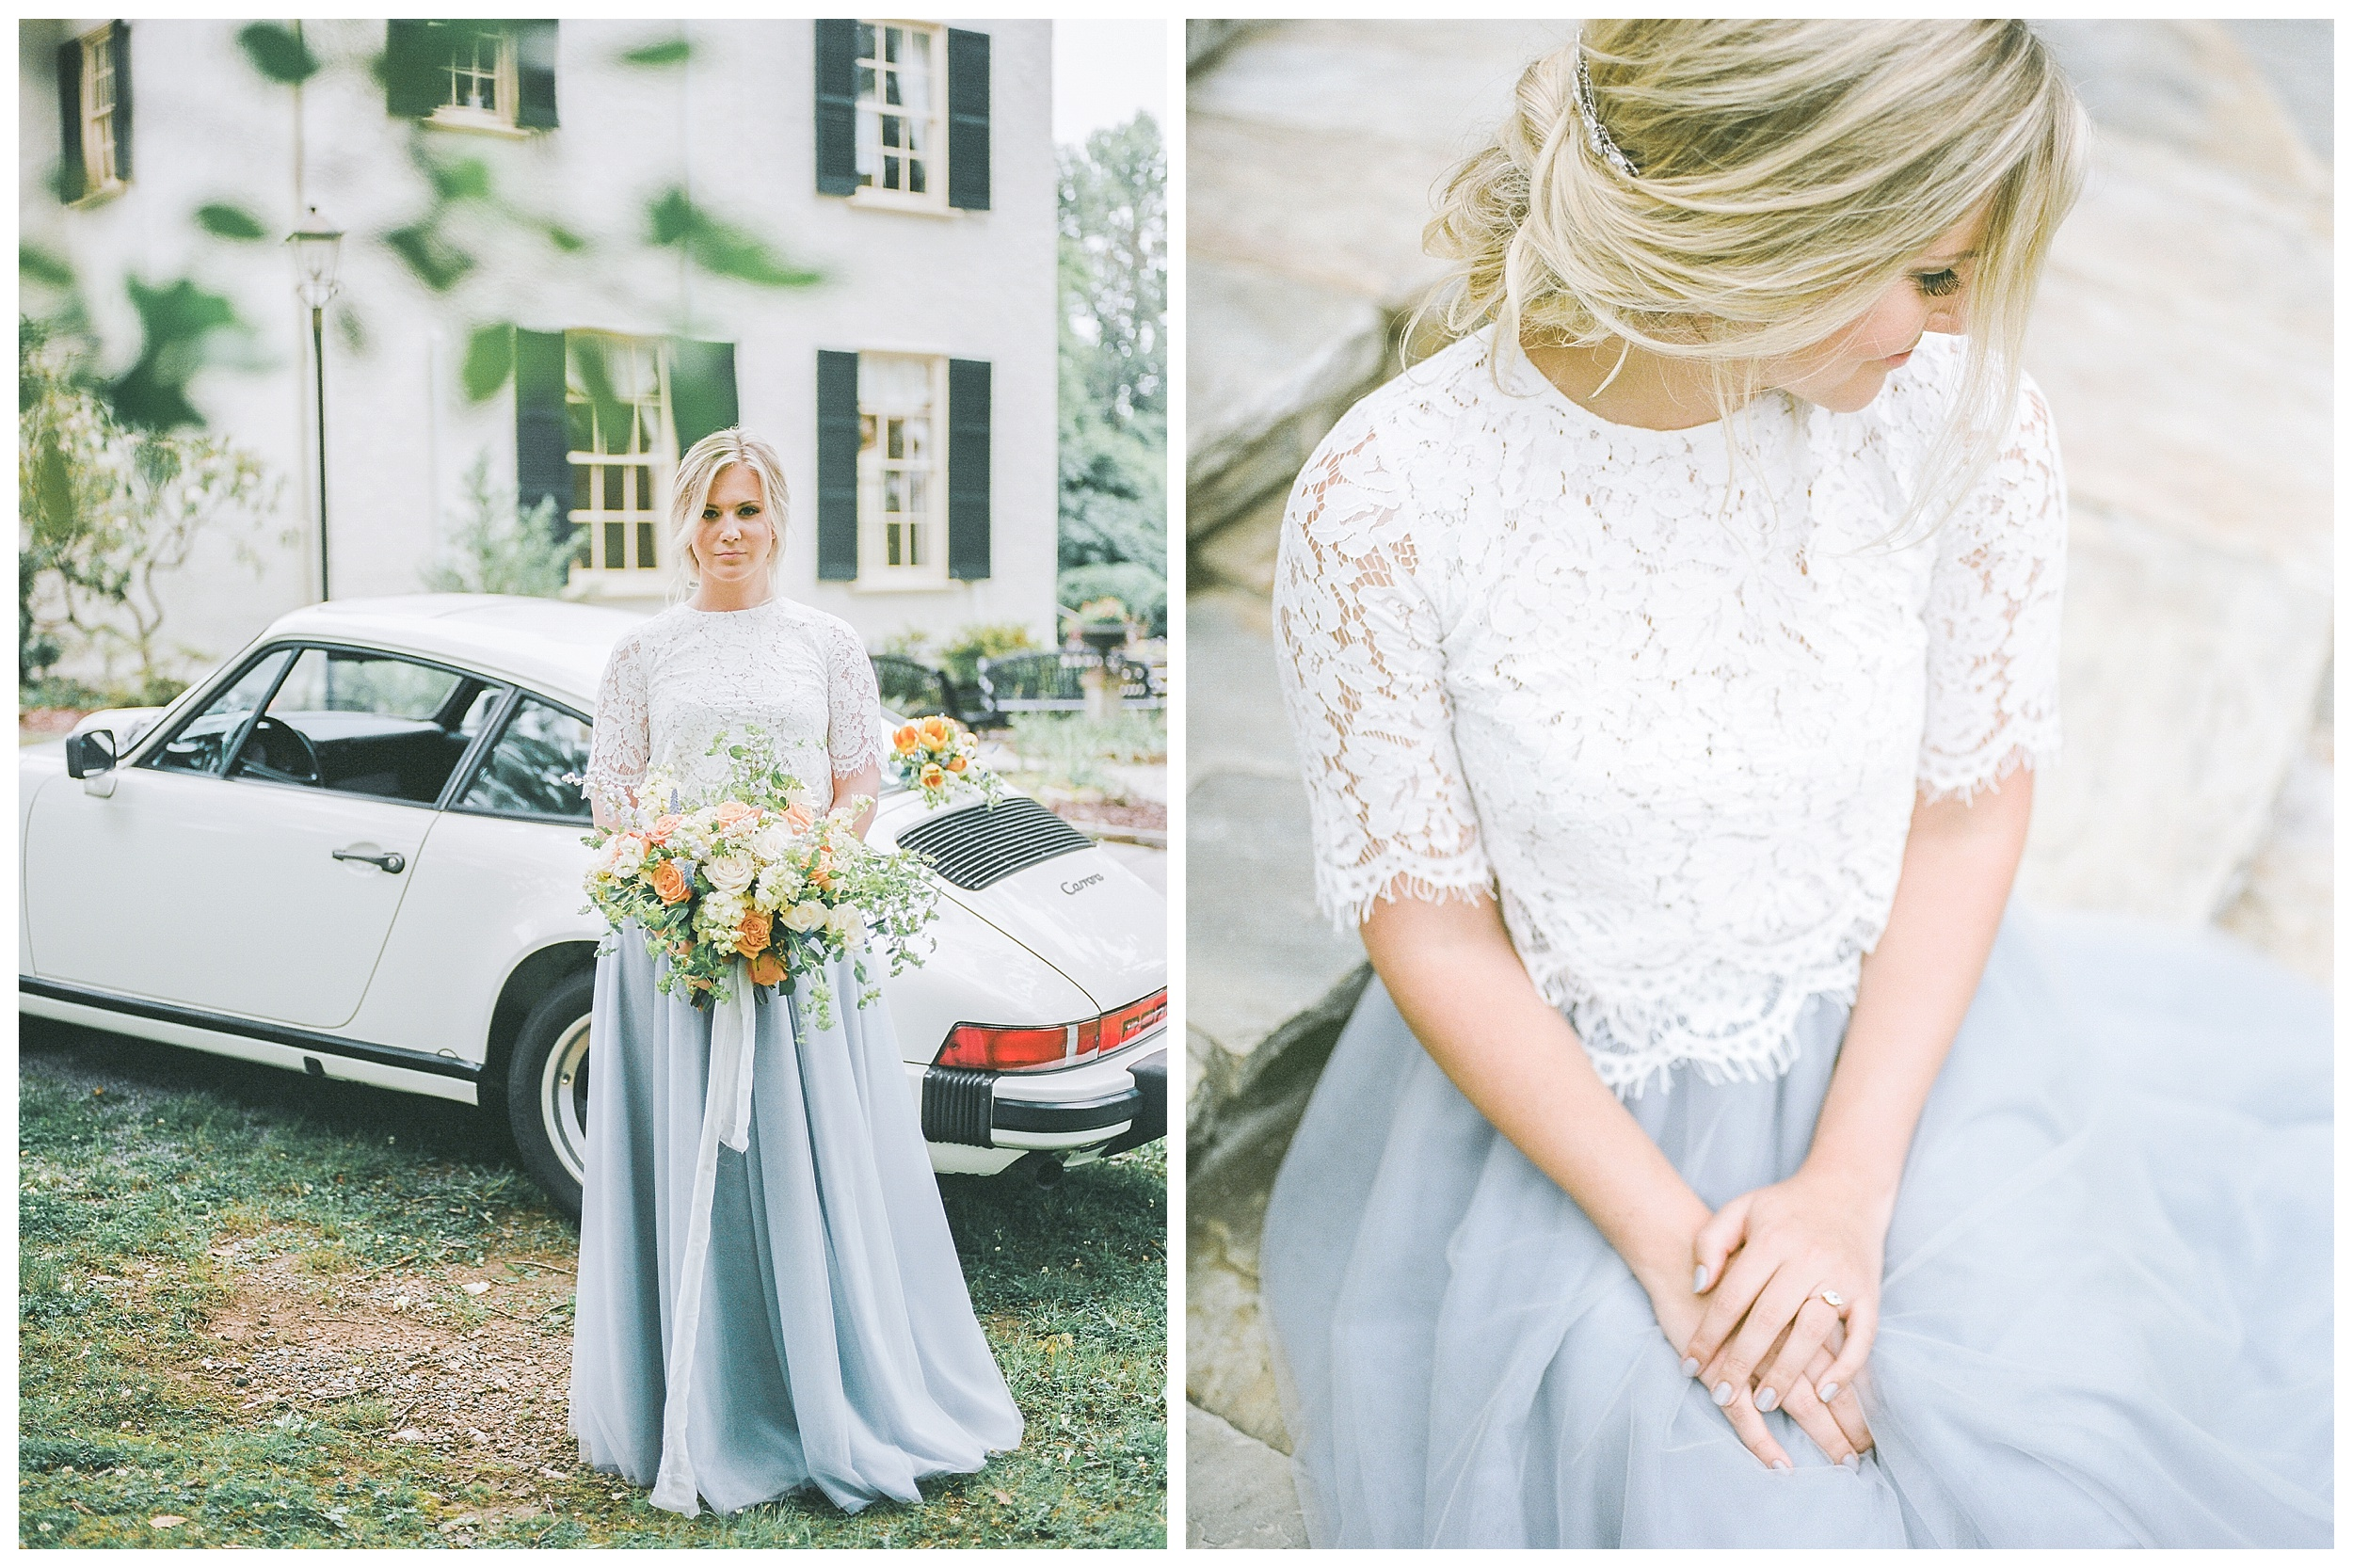 Rust Manor Wedding   Virginia Wedding Photographer Kir Tuben_0051.jpg